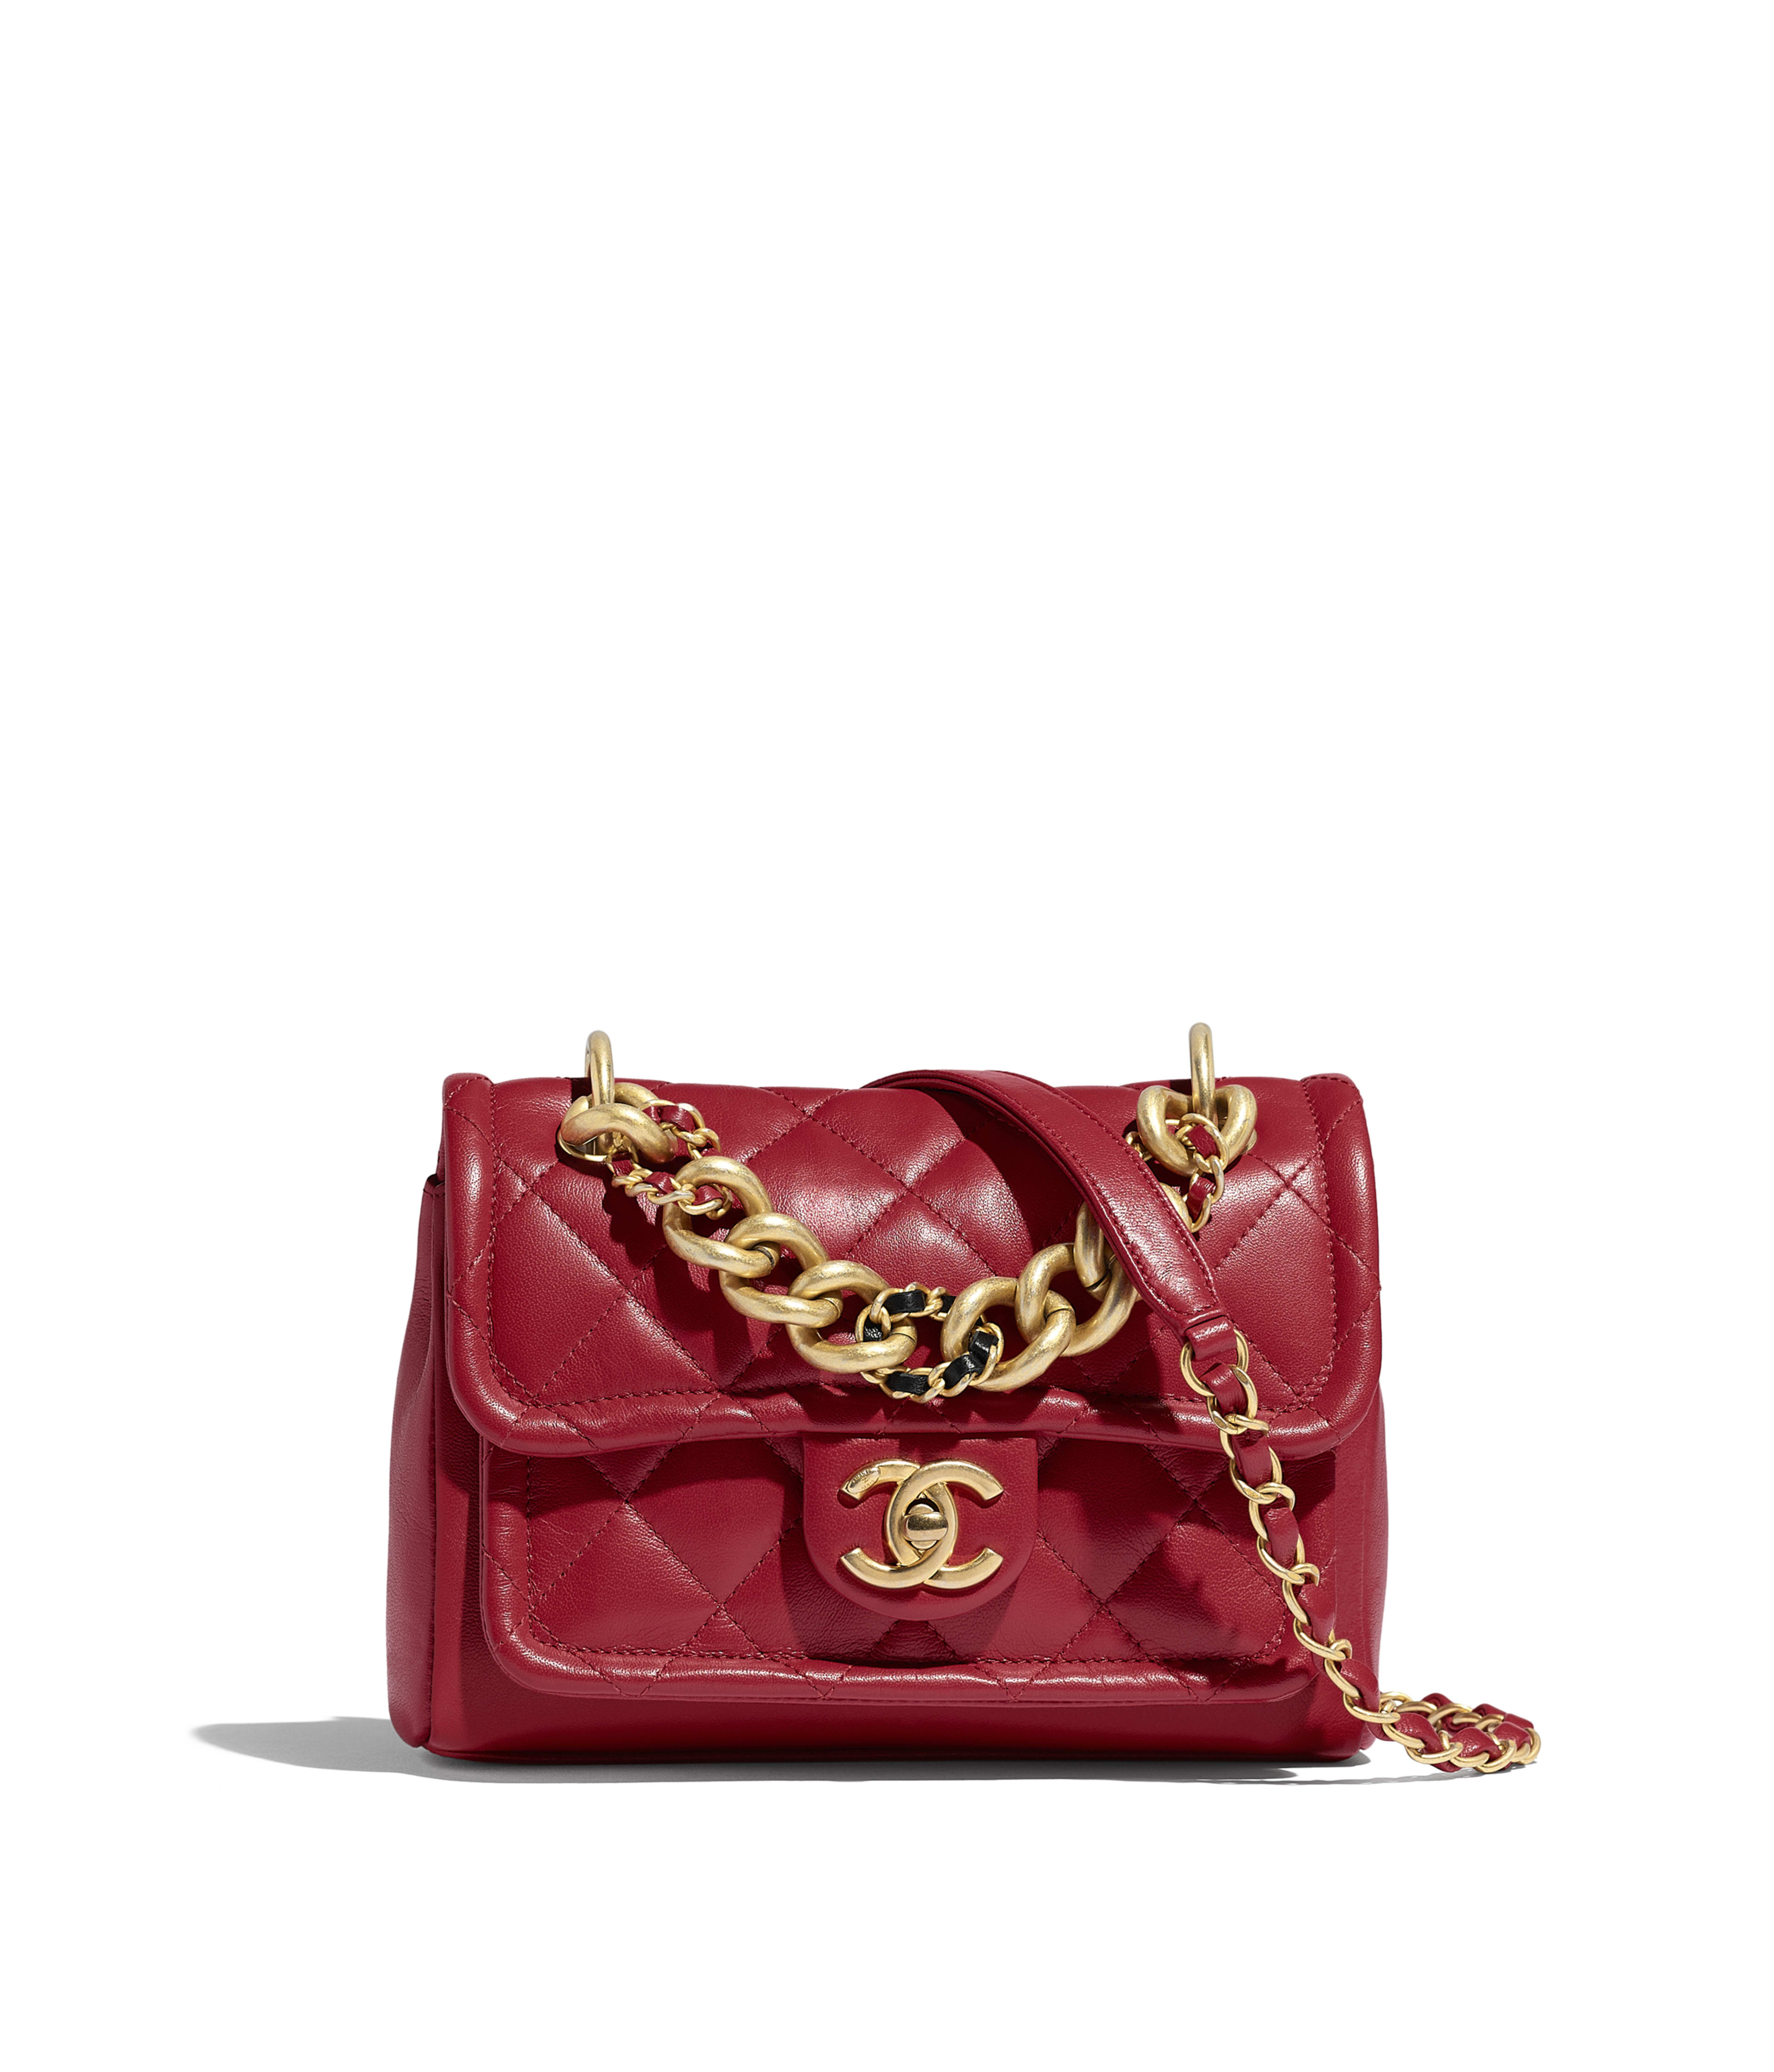 7c8036f1a981c9 Flap Bag Lambskin & Gold-Tone Metal, Red Ref. AS0936B01190N4855